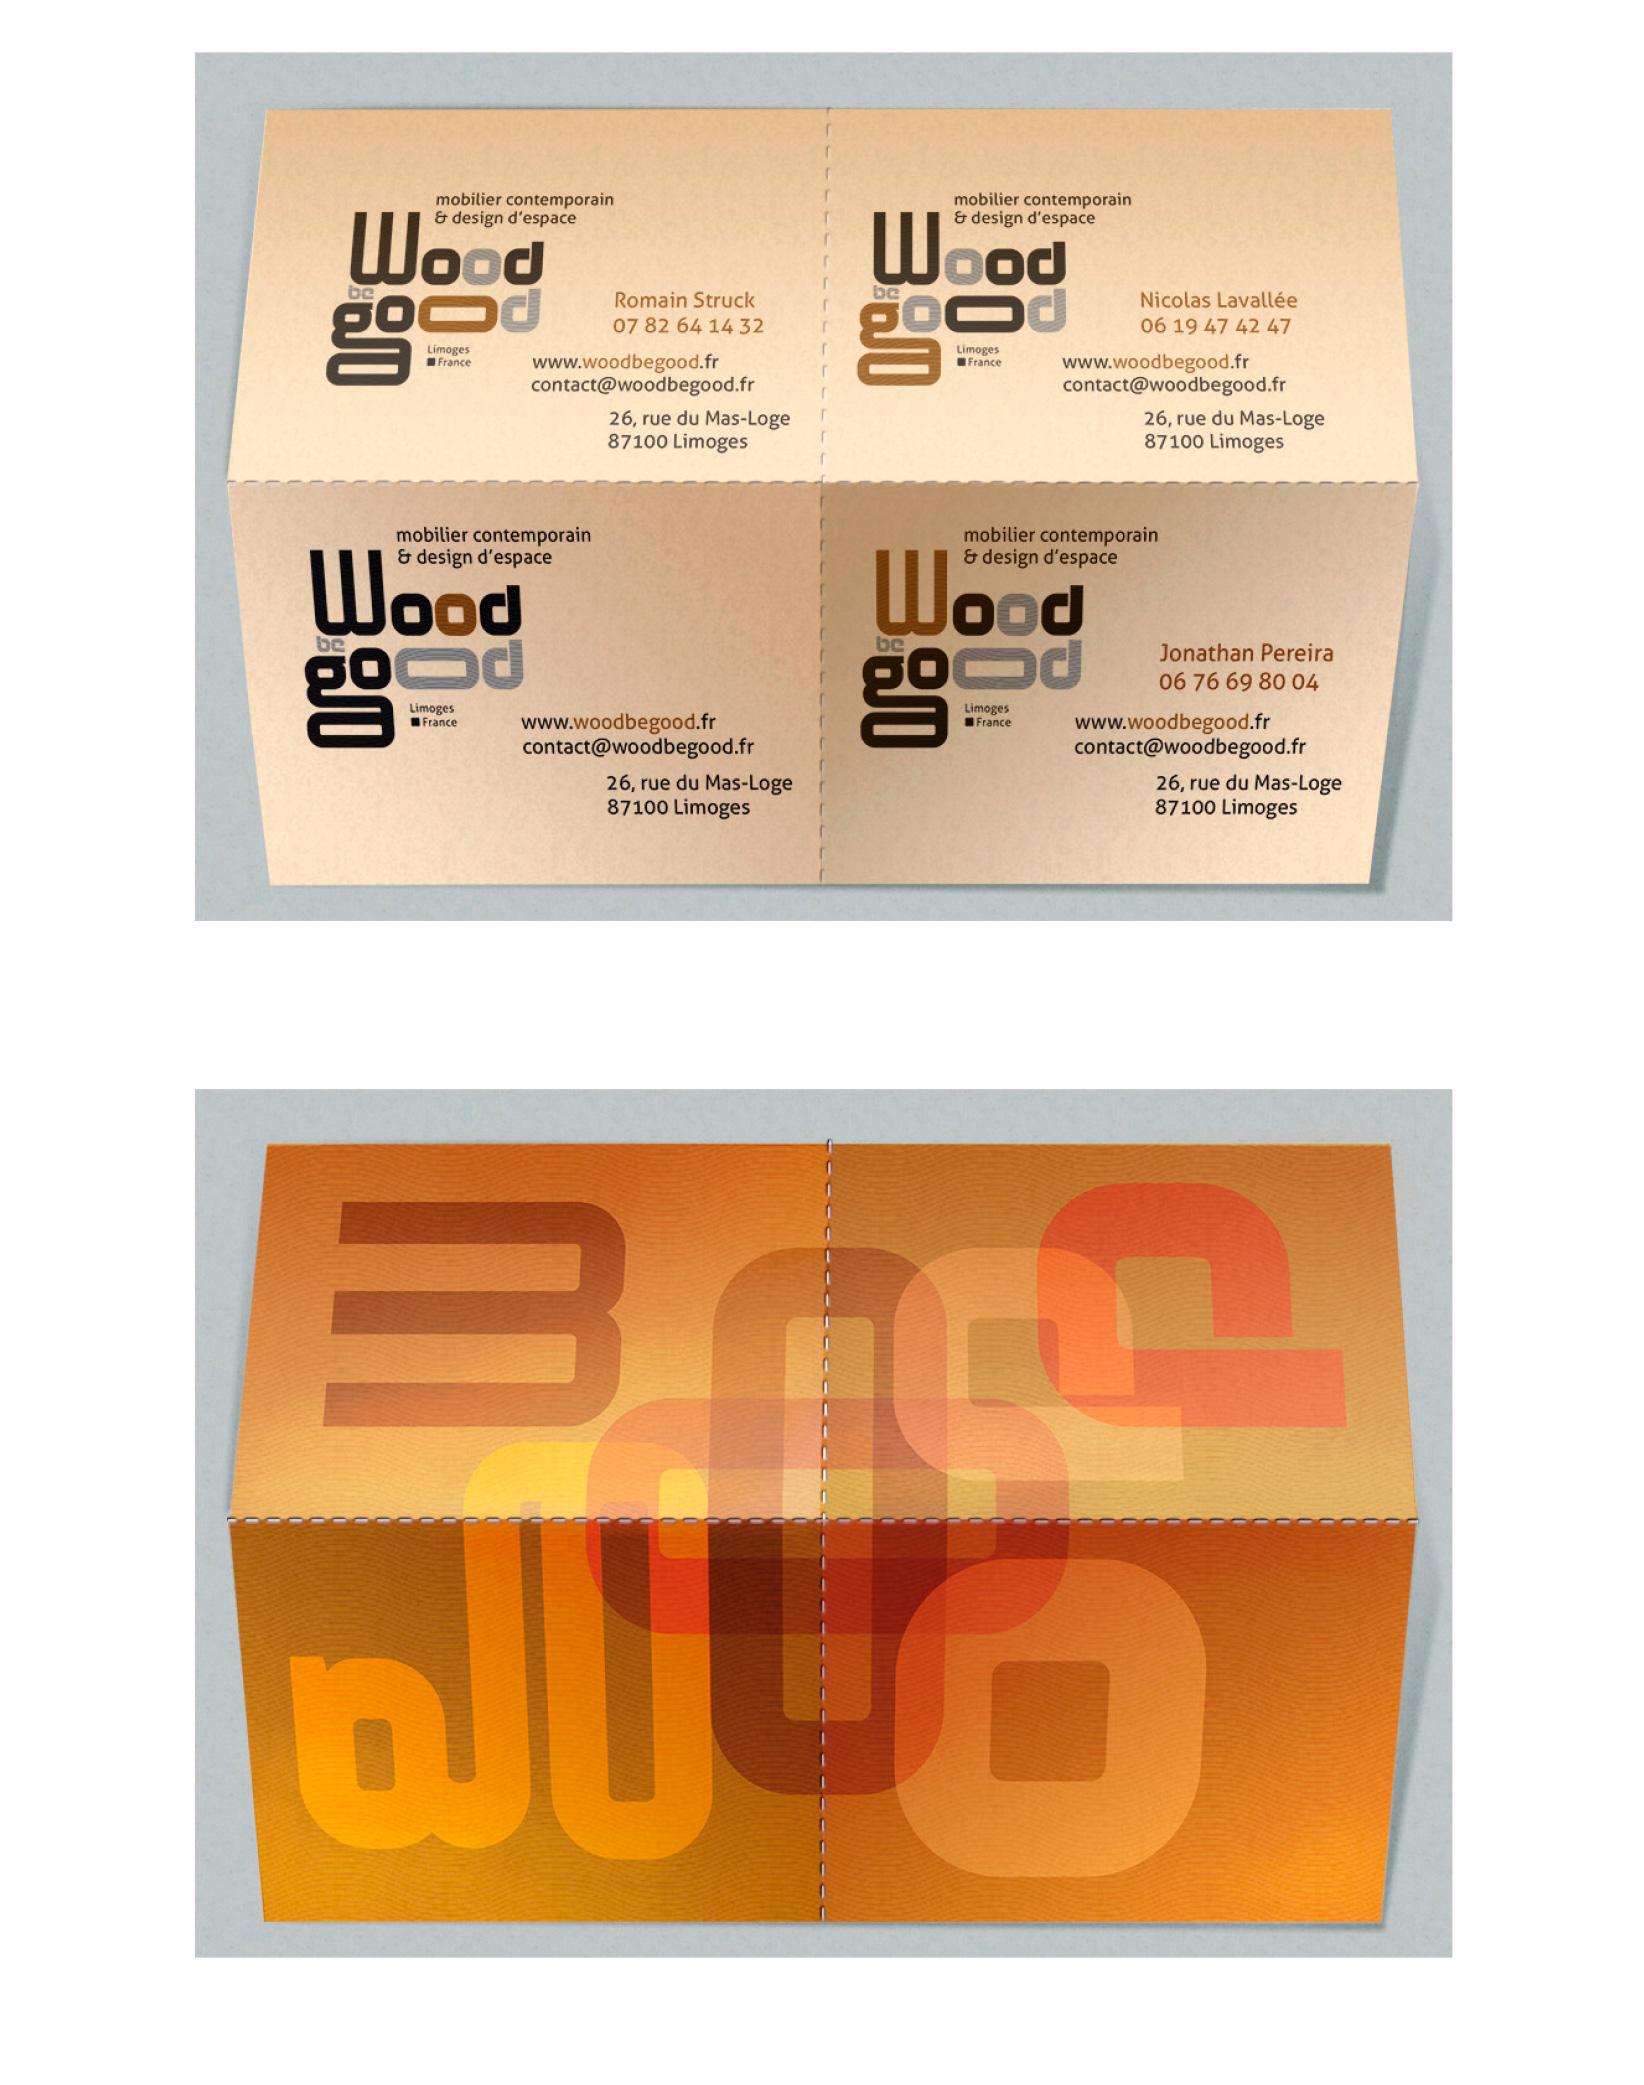 wood-be-good-cartes-ensemble